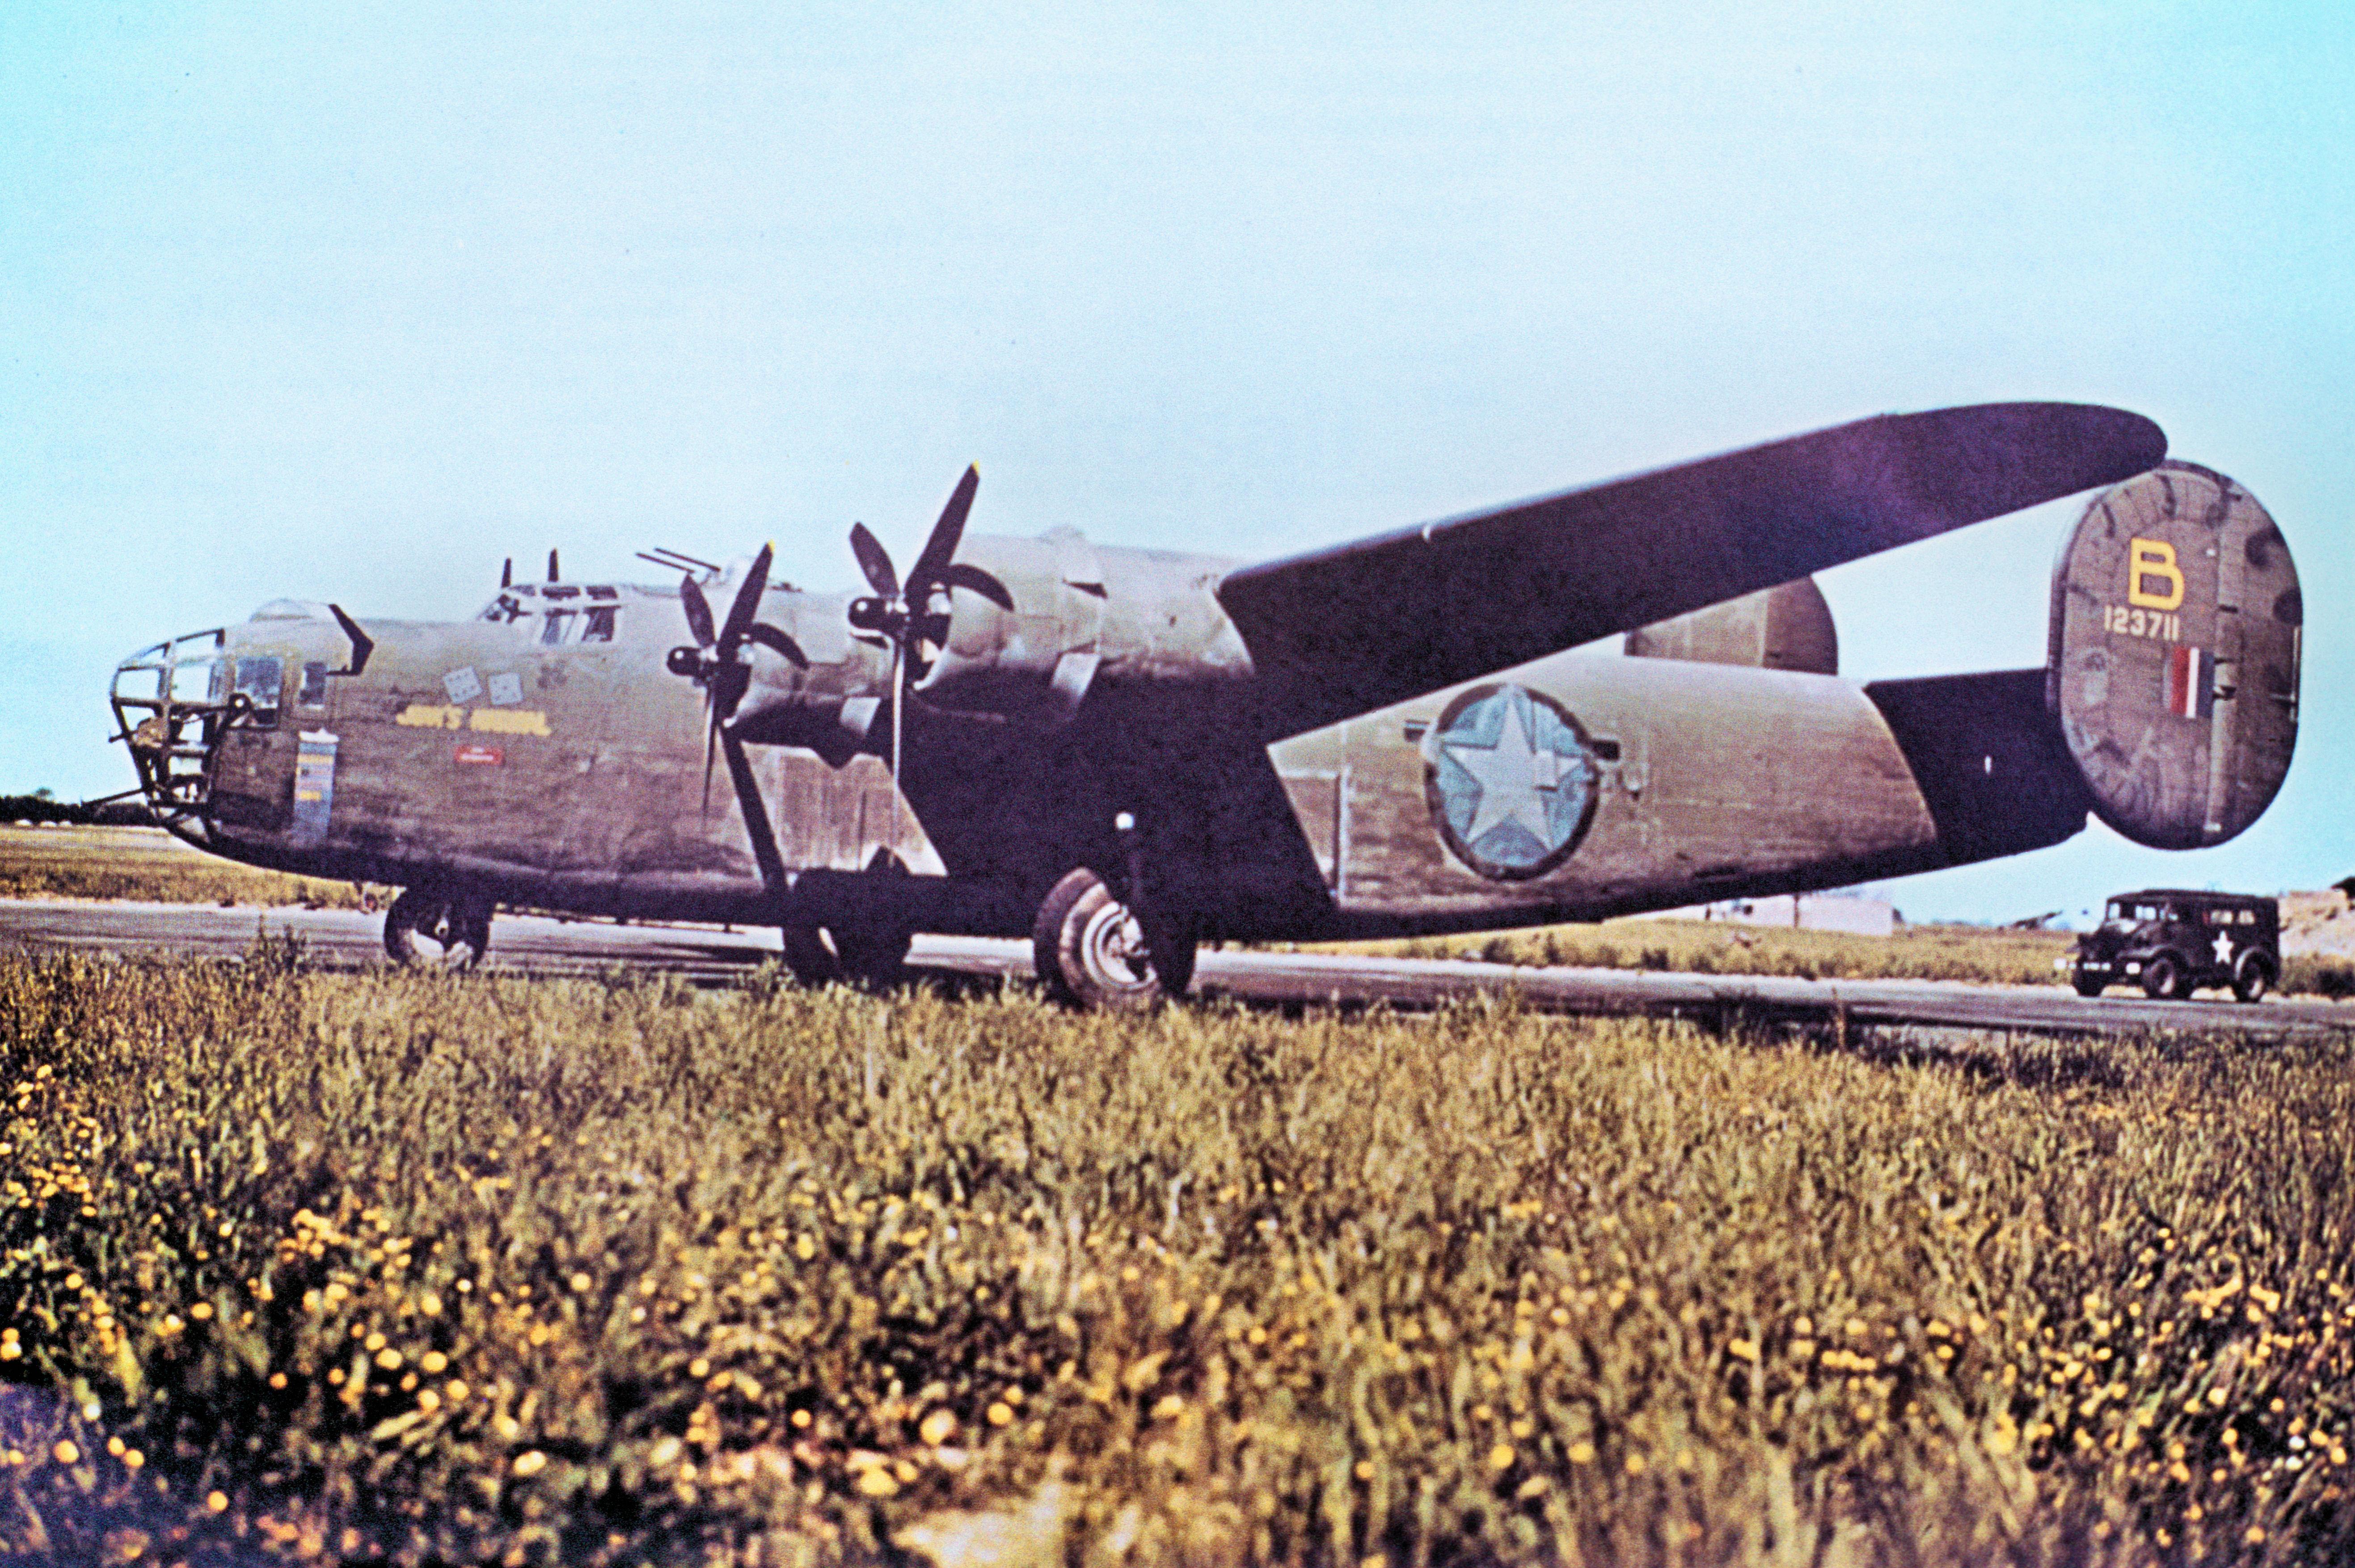 raf alconbury military wiki fandom powered by wikia 41 23711 at raf alconbury england in 1942 this aircraft was lost over 1 1943 macr 3301